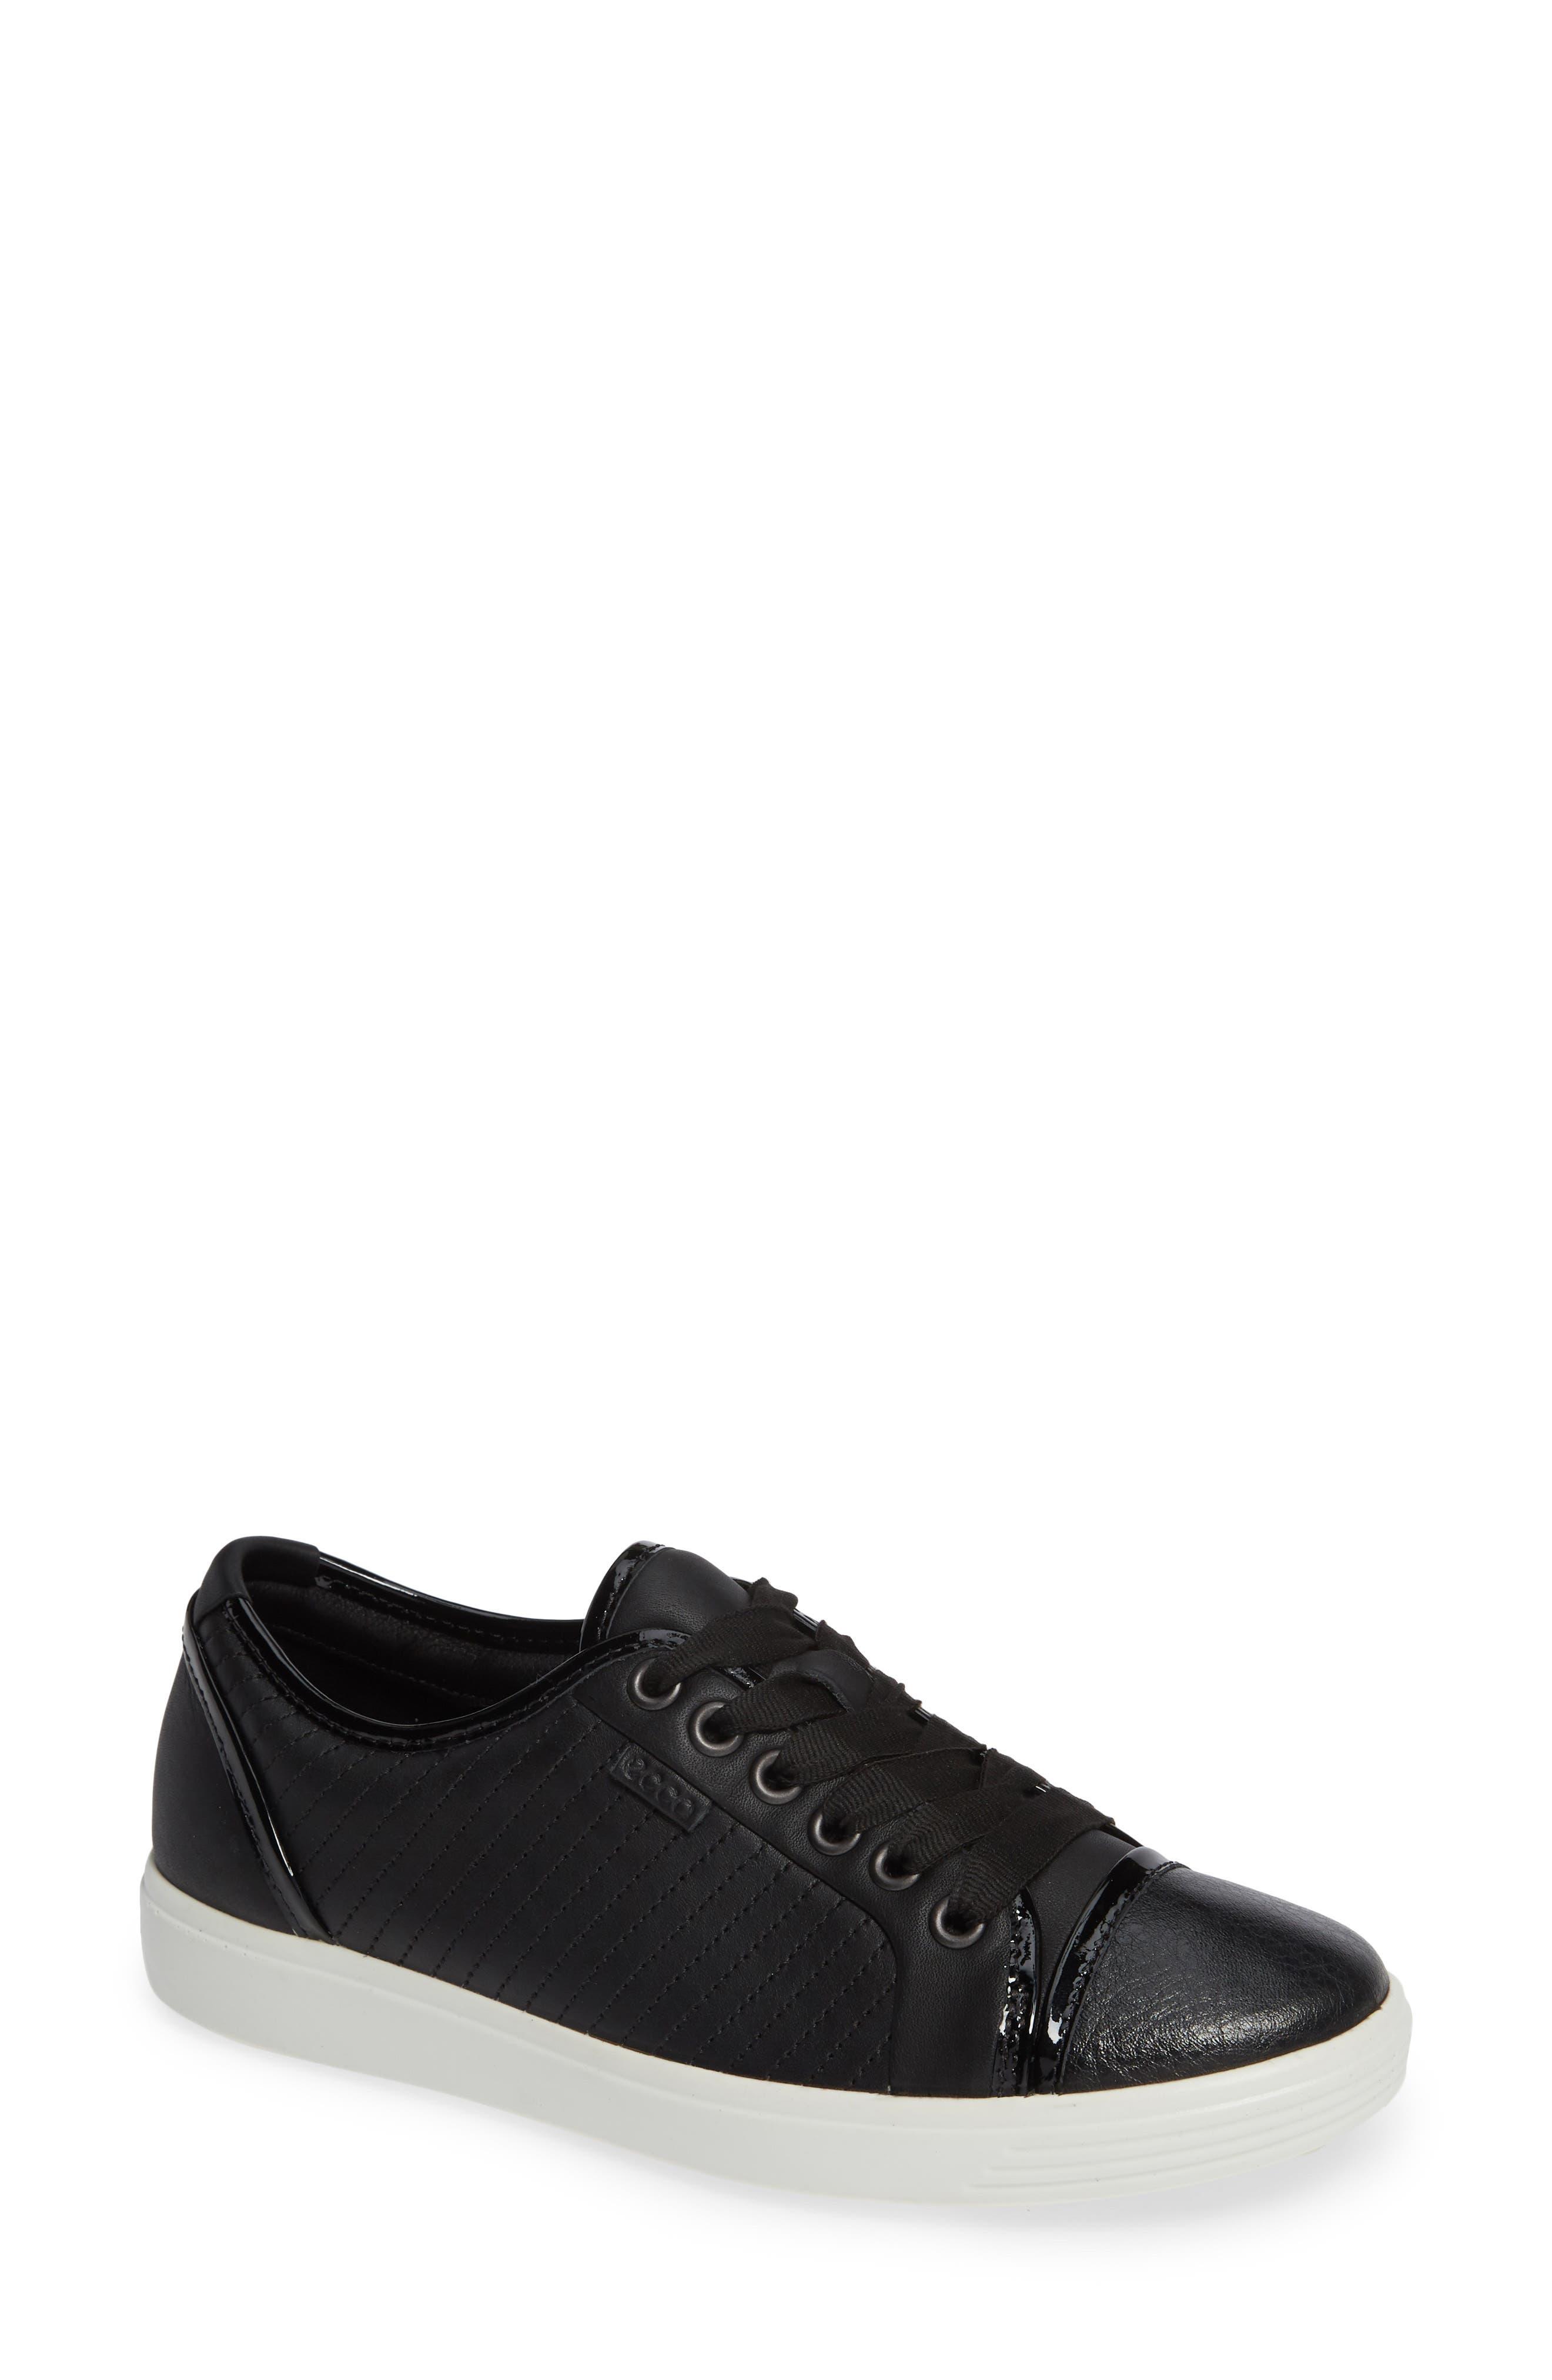 Soft 7 Cap Toe Sneaker,                             Main thumbnail 1, color,                             BLACK LEATHER